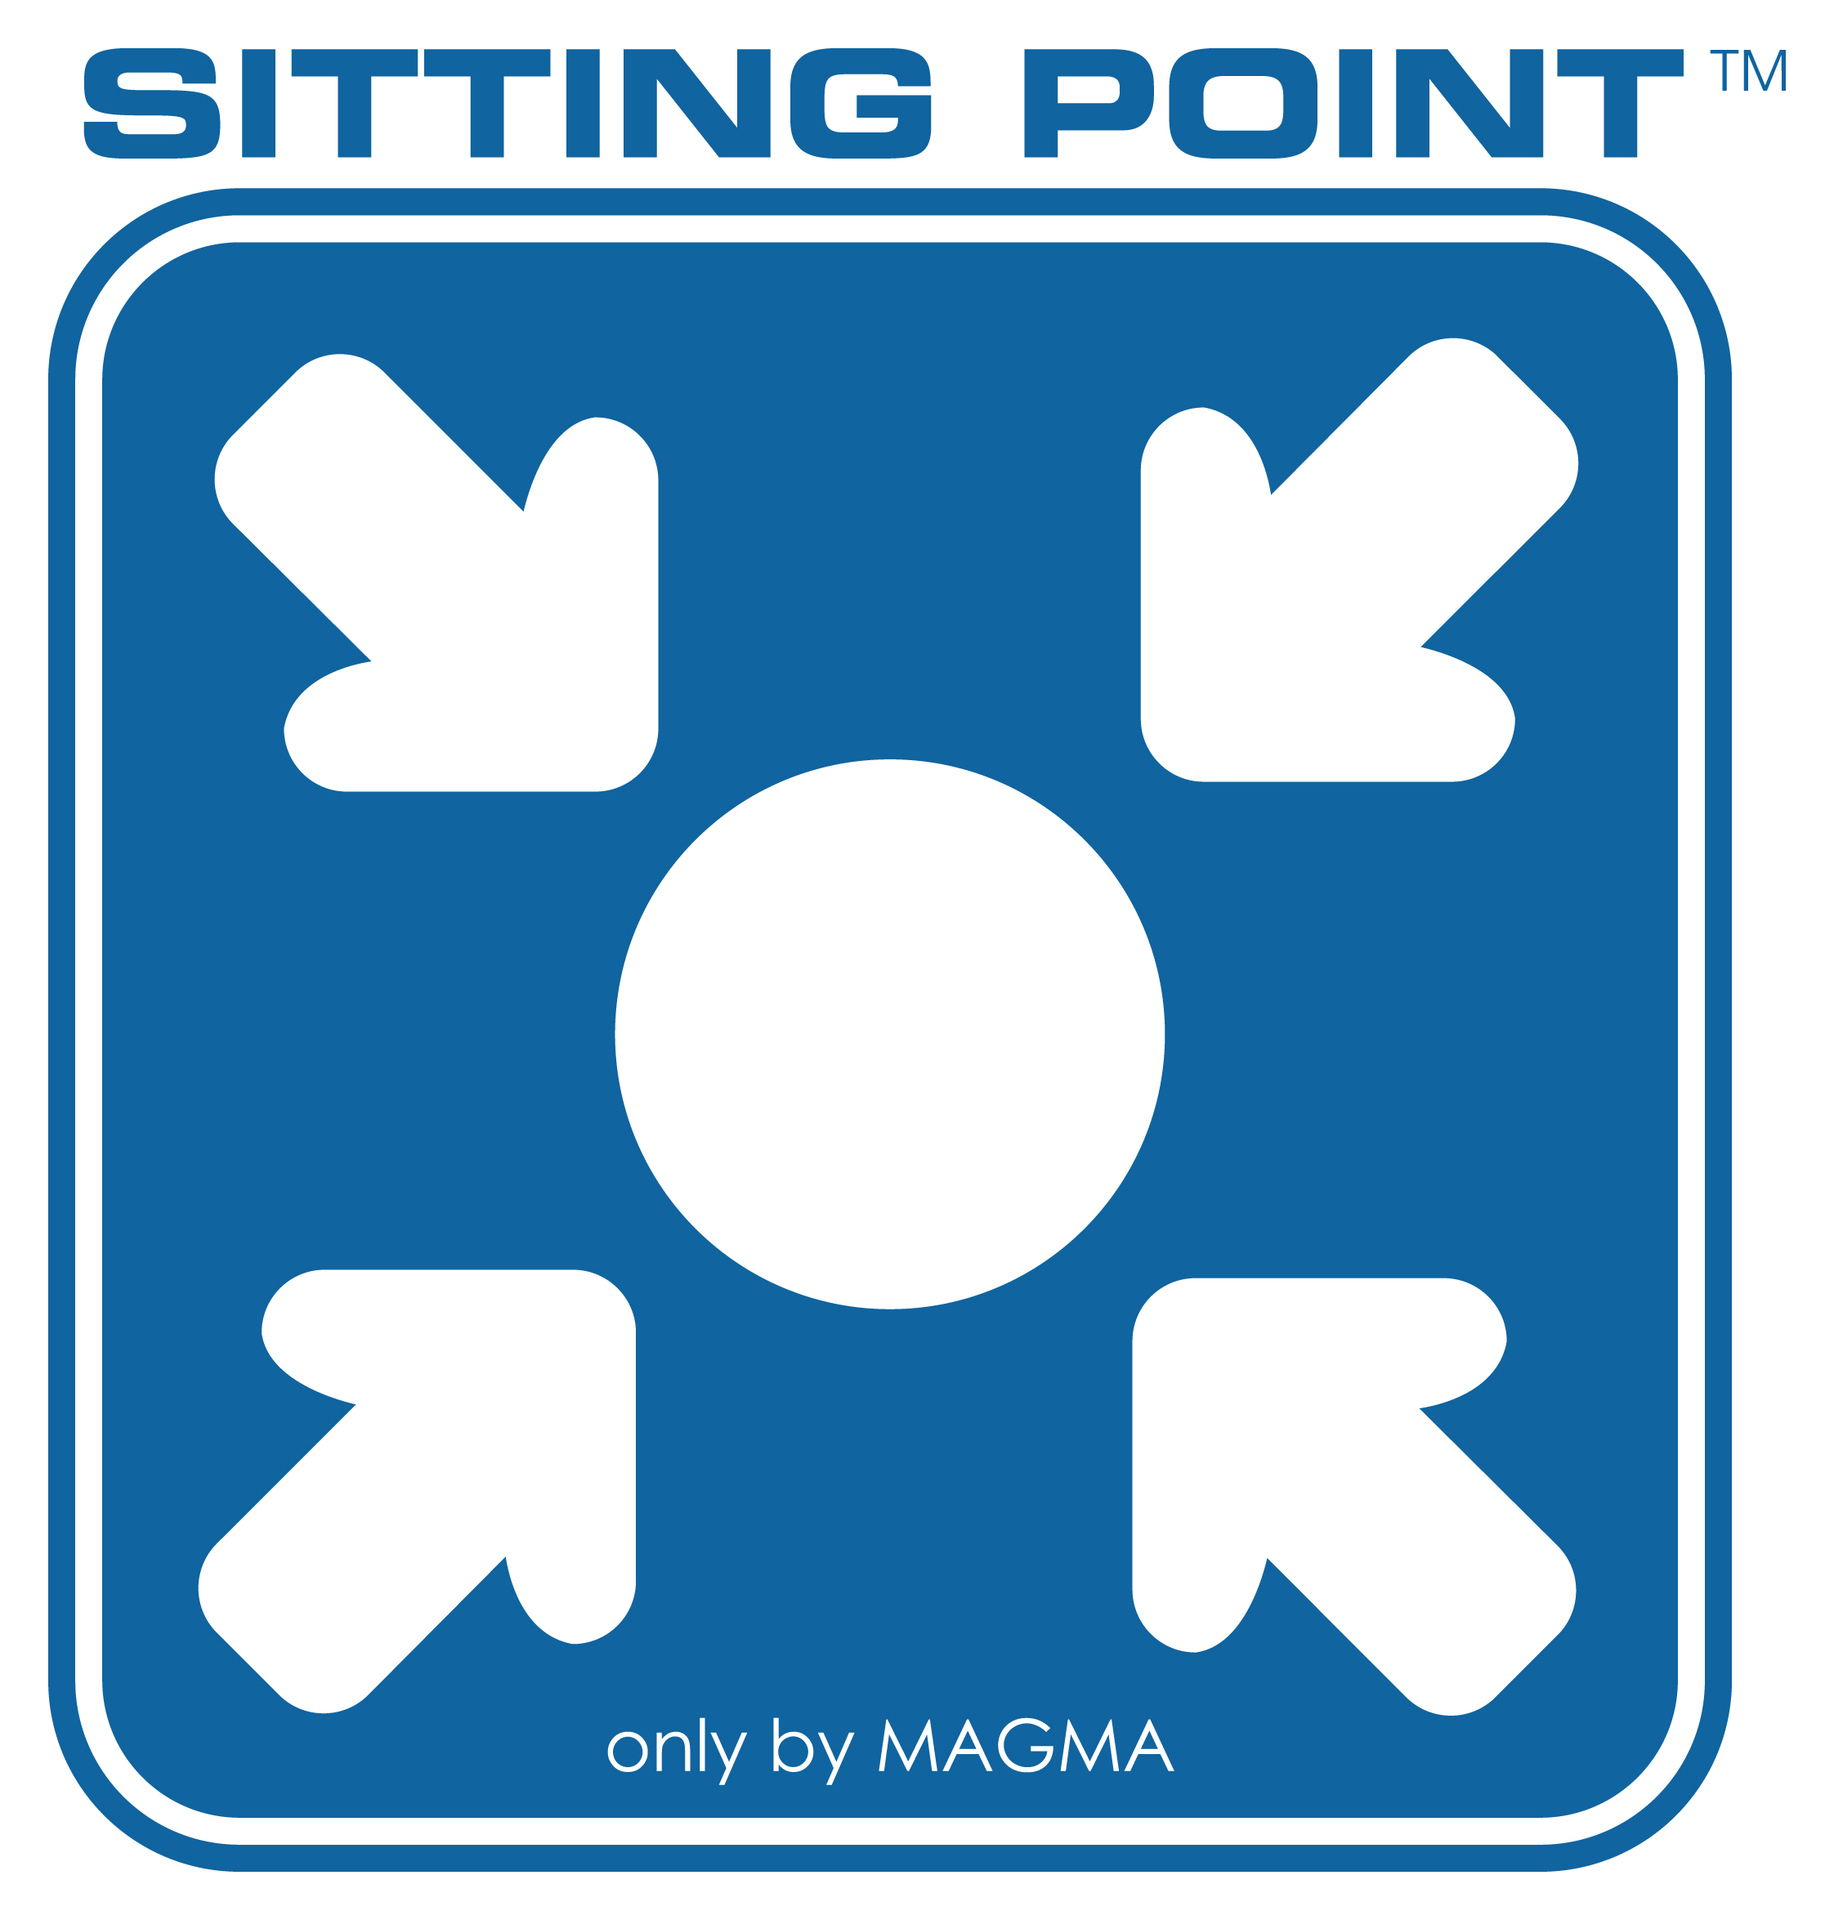 logo sittingpoint 4c